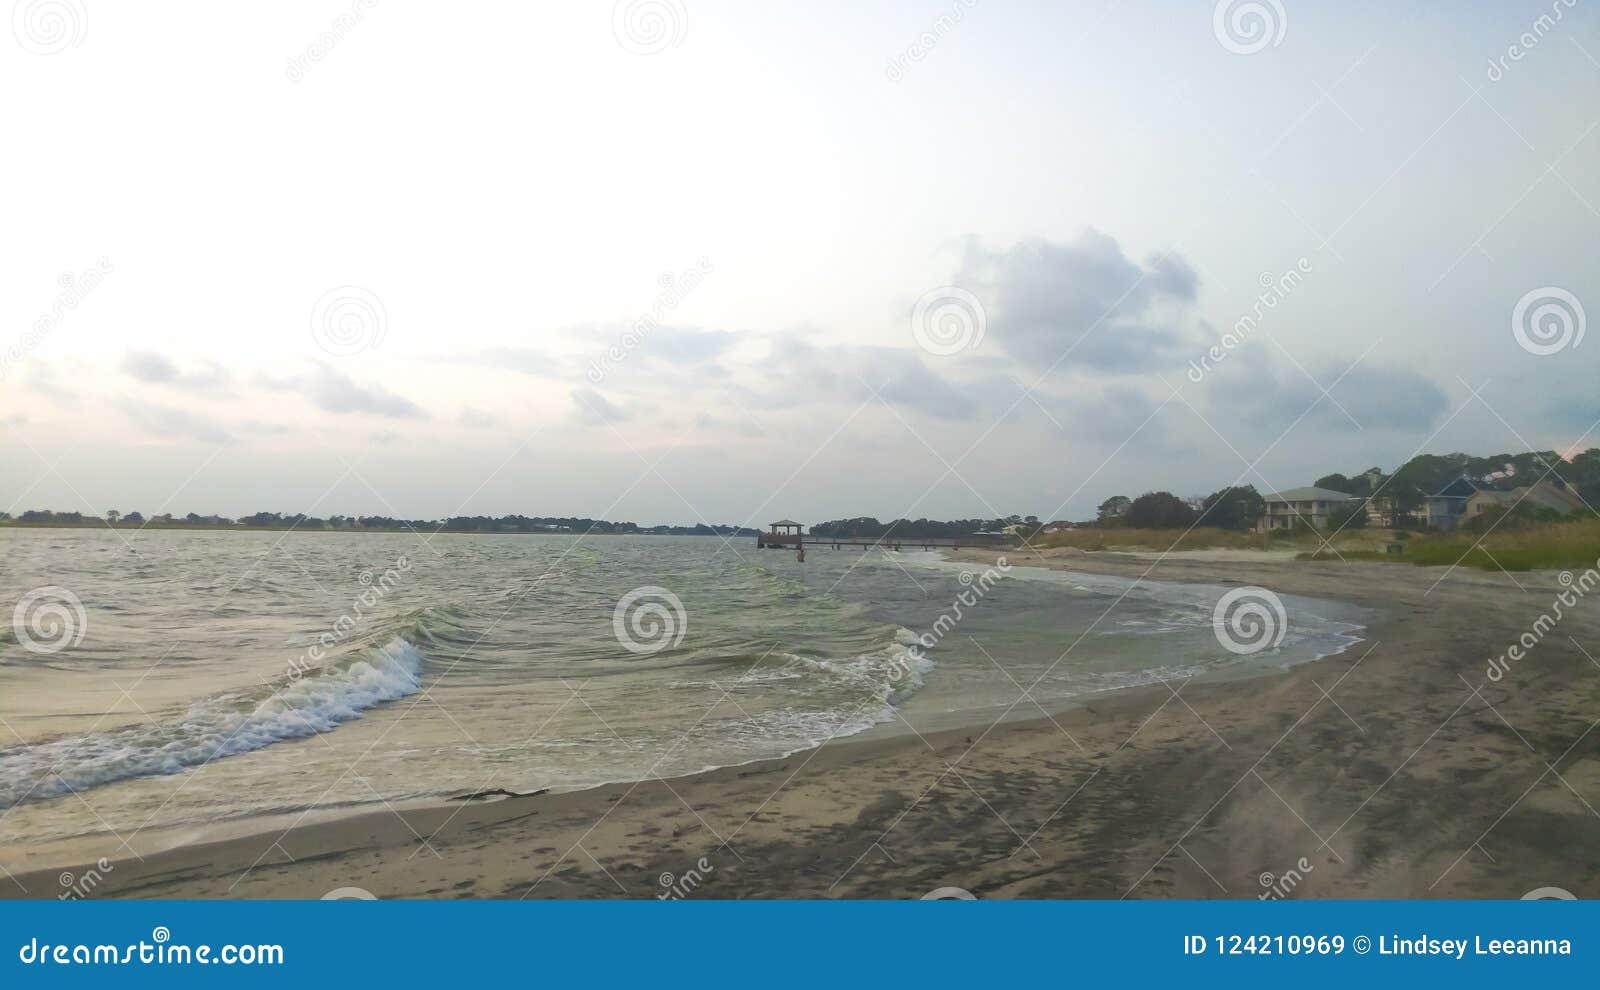 Ozean-Landschaft, Wasser-Landschaft